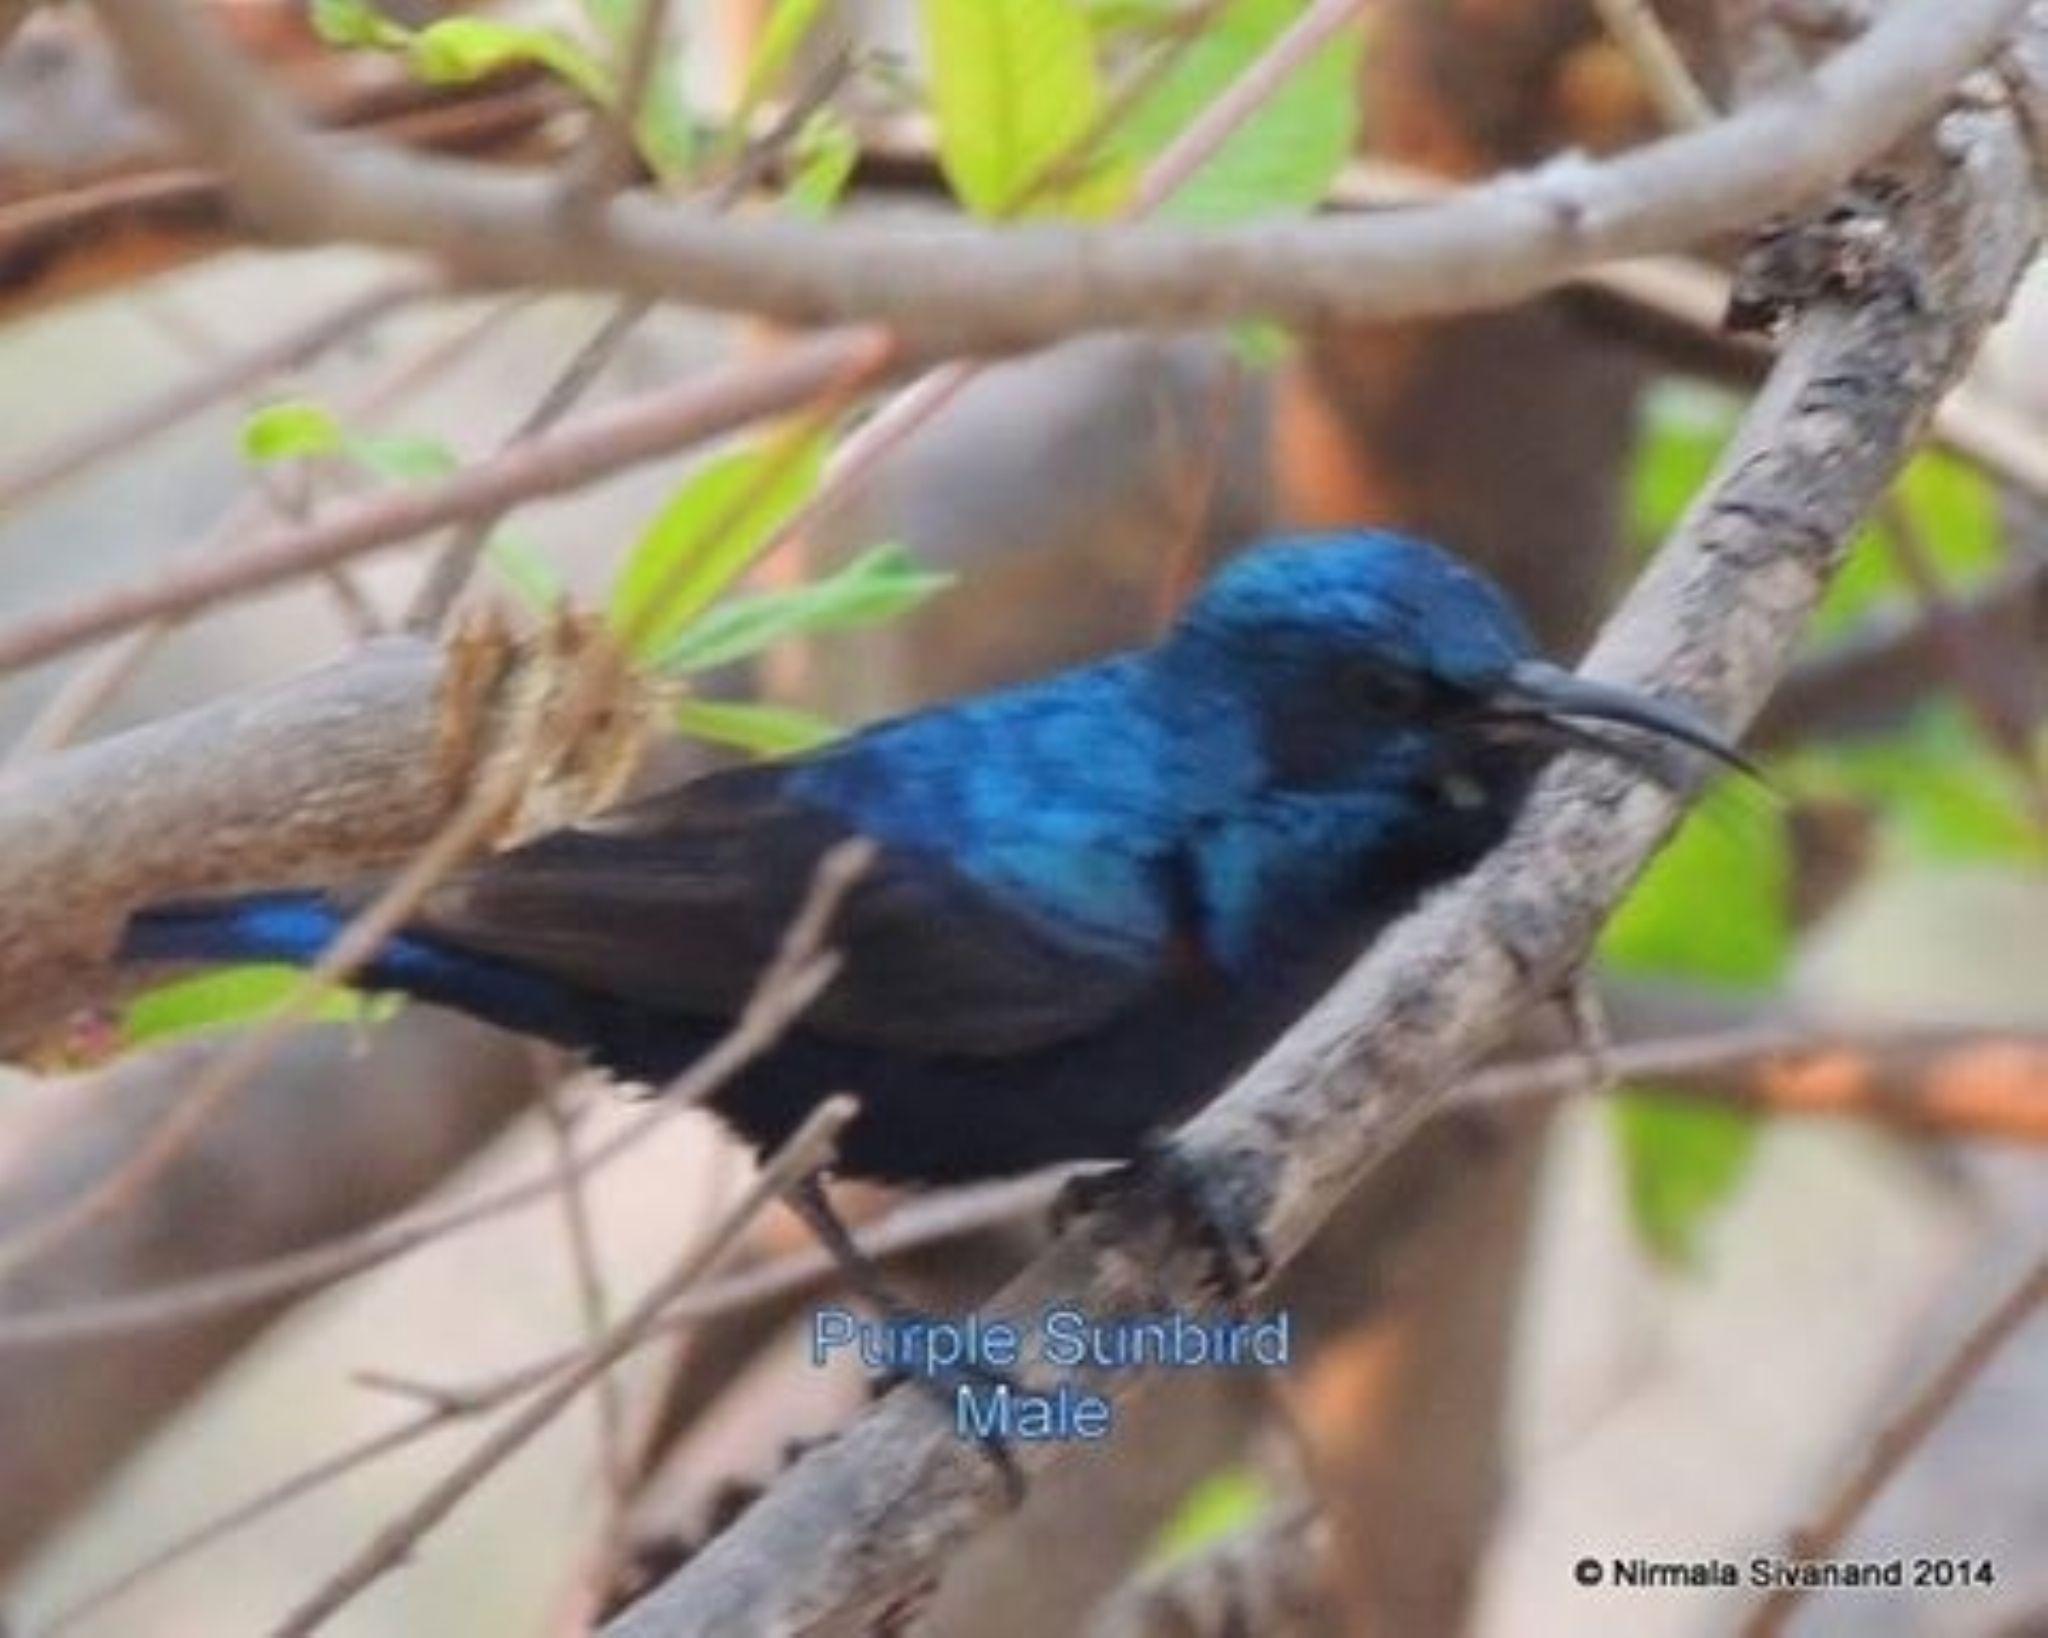 Purple sunbird male by Nirmala Sivanand